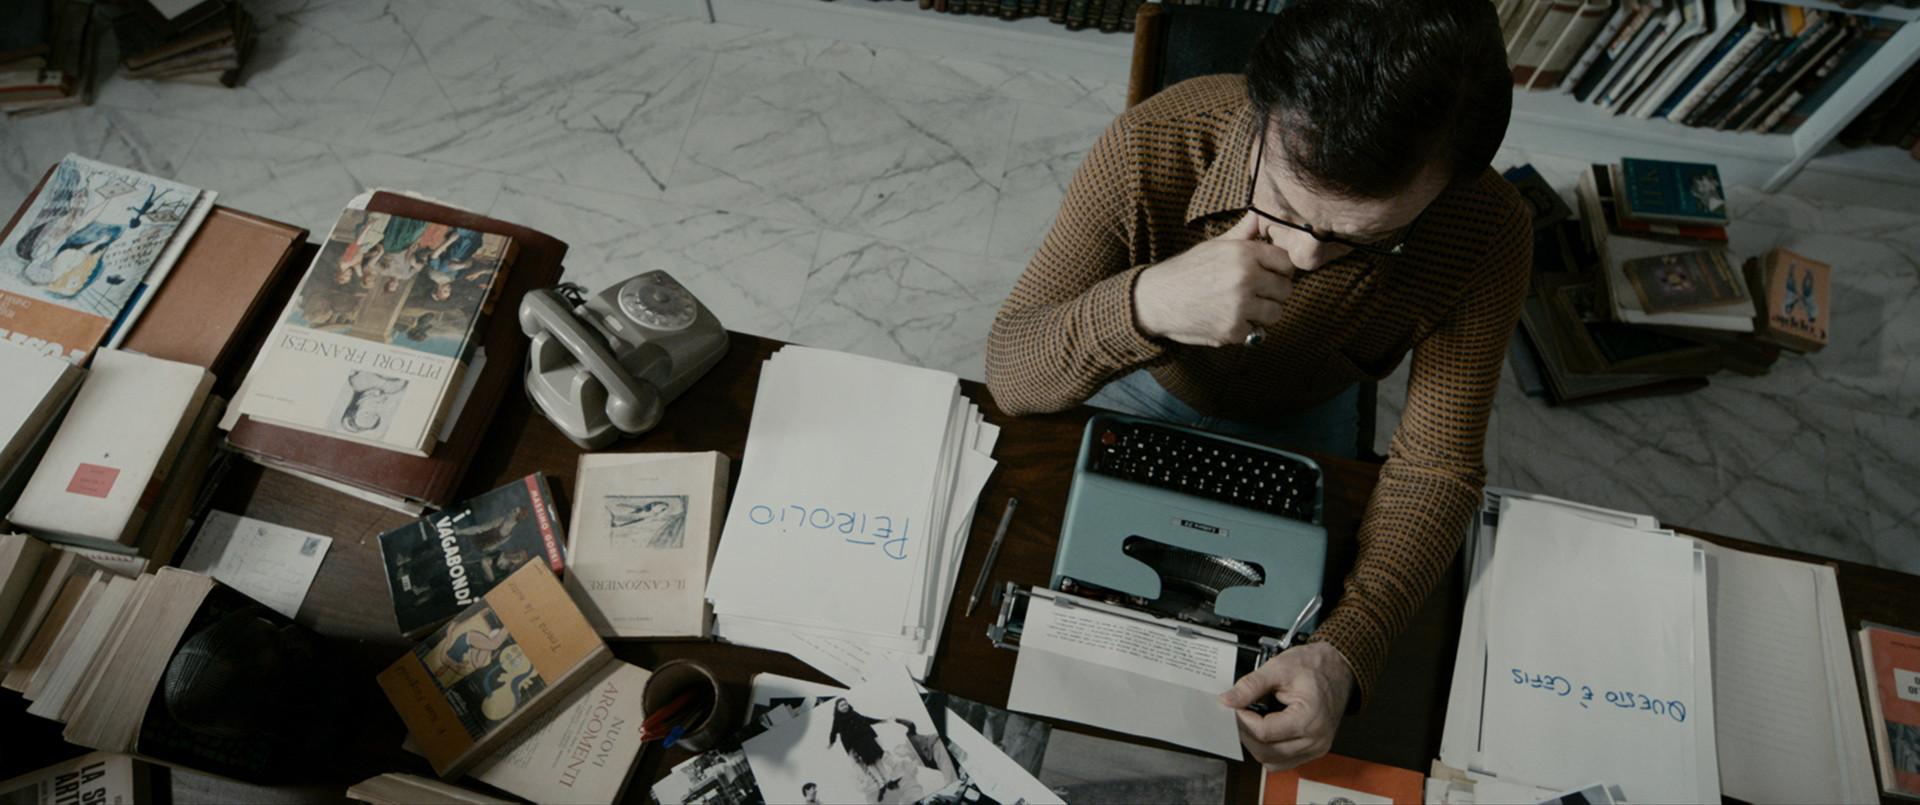 Pasolini_©2iFILMS_Photo_63.jpg